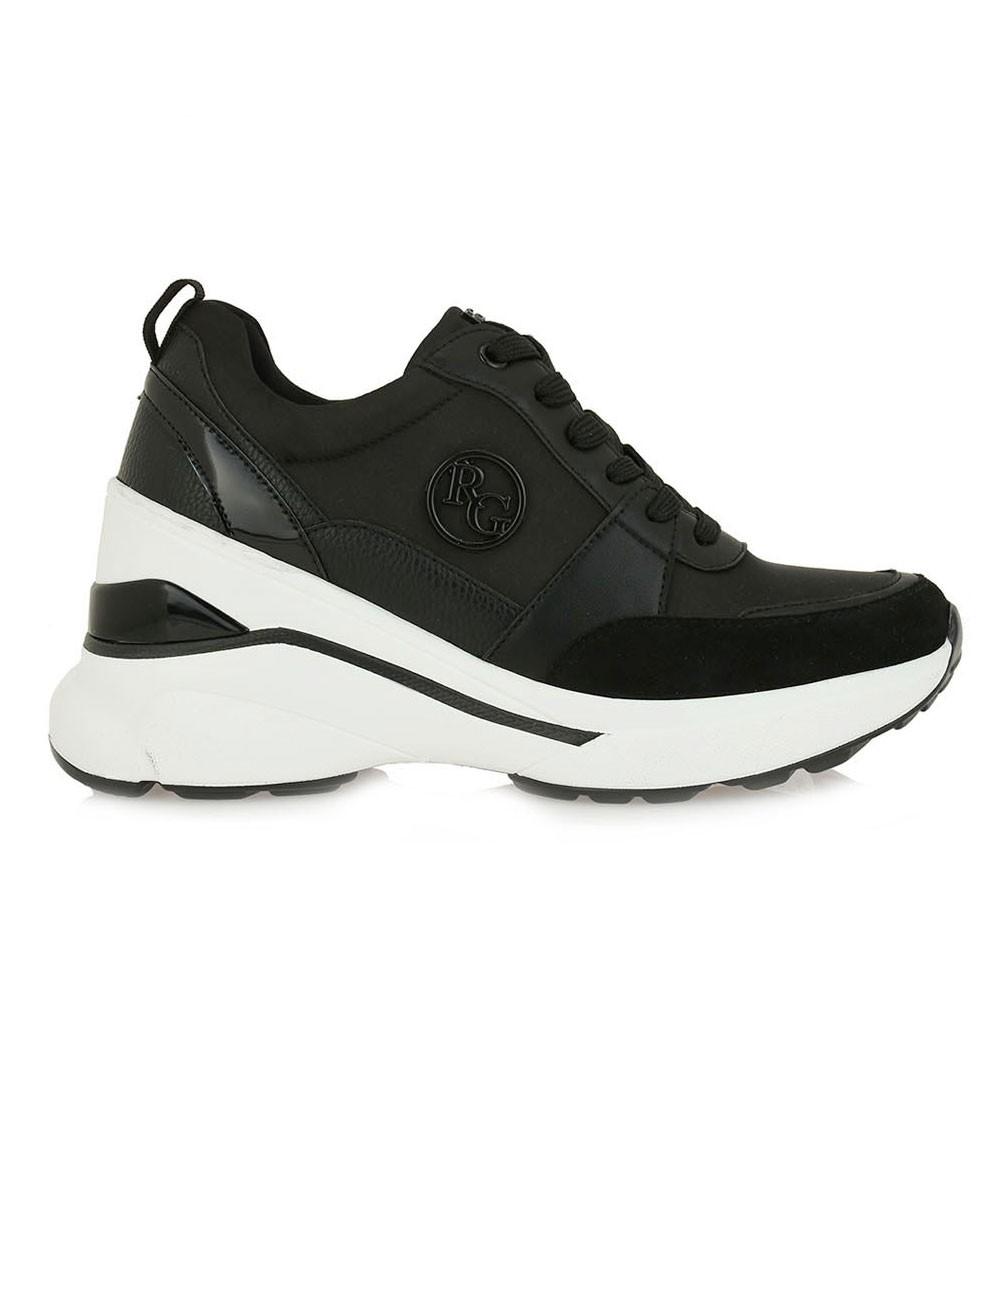 Renato Garini Γυναικεία Παπούτσια Sneakers 215-19R Μαύρο N119R2154001